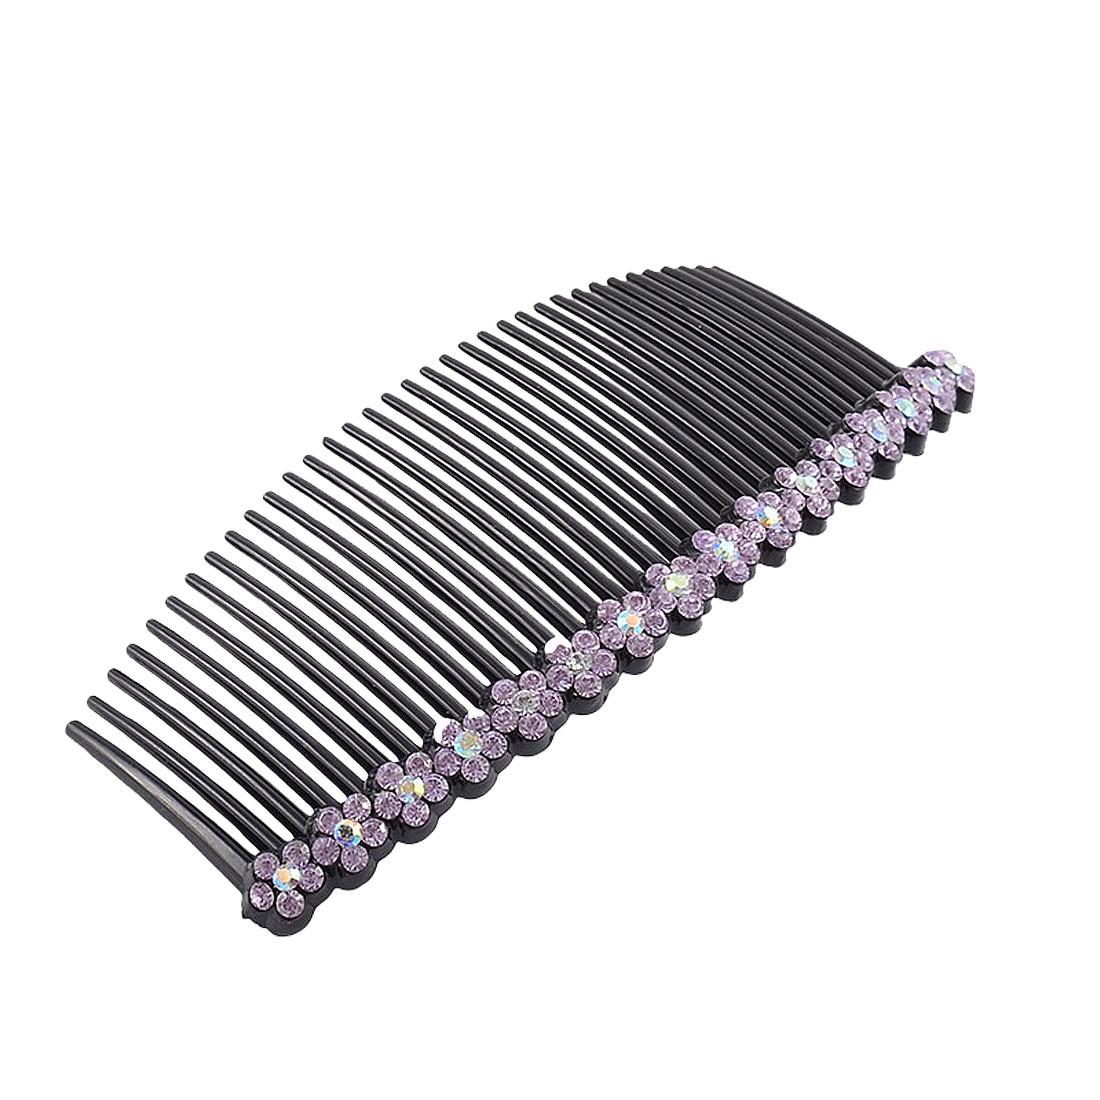 Woman Plastic Flower Shaped Rhinestone Decor 35 Teeth Hair Clip Comb Purple